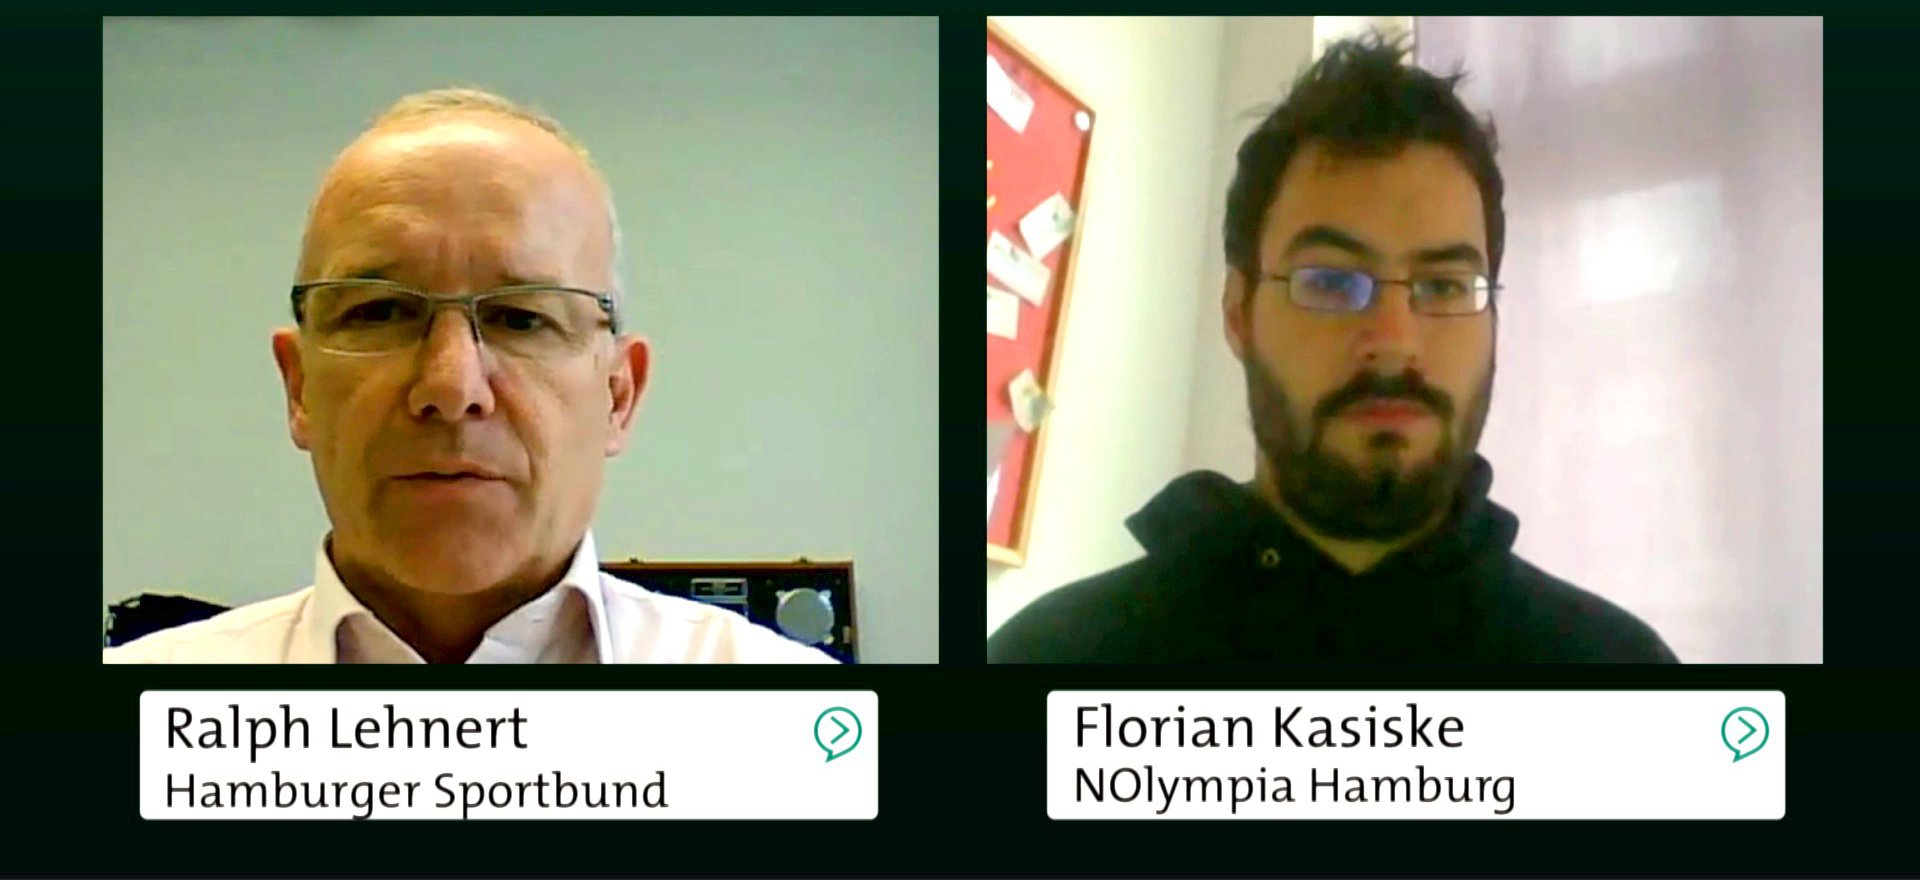 Ralph Lehnert (Hamburger Sportbund) und Florian Kasiske (NOlympia Hamburg), 2015.